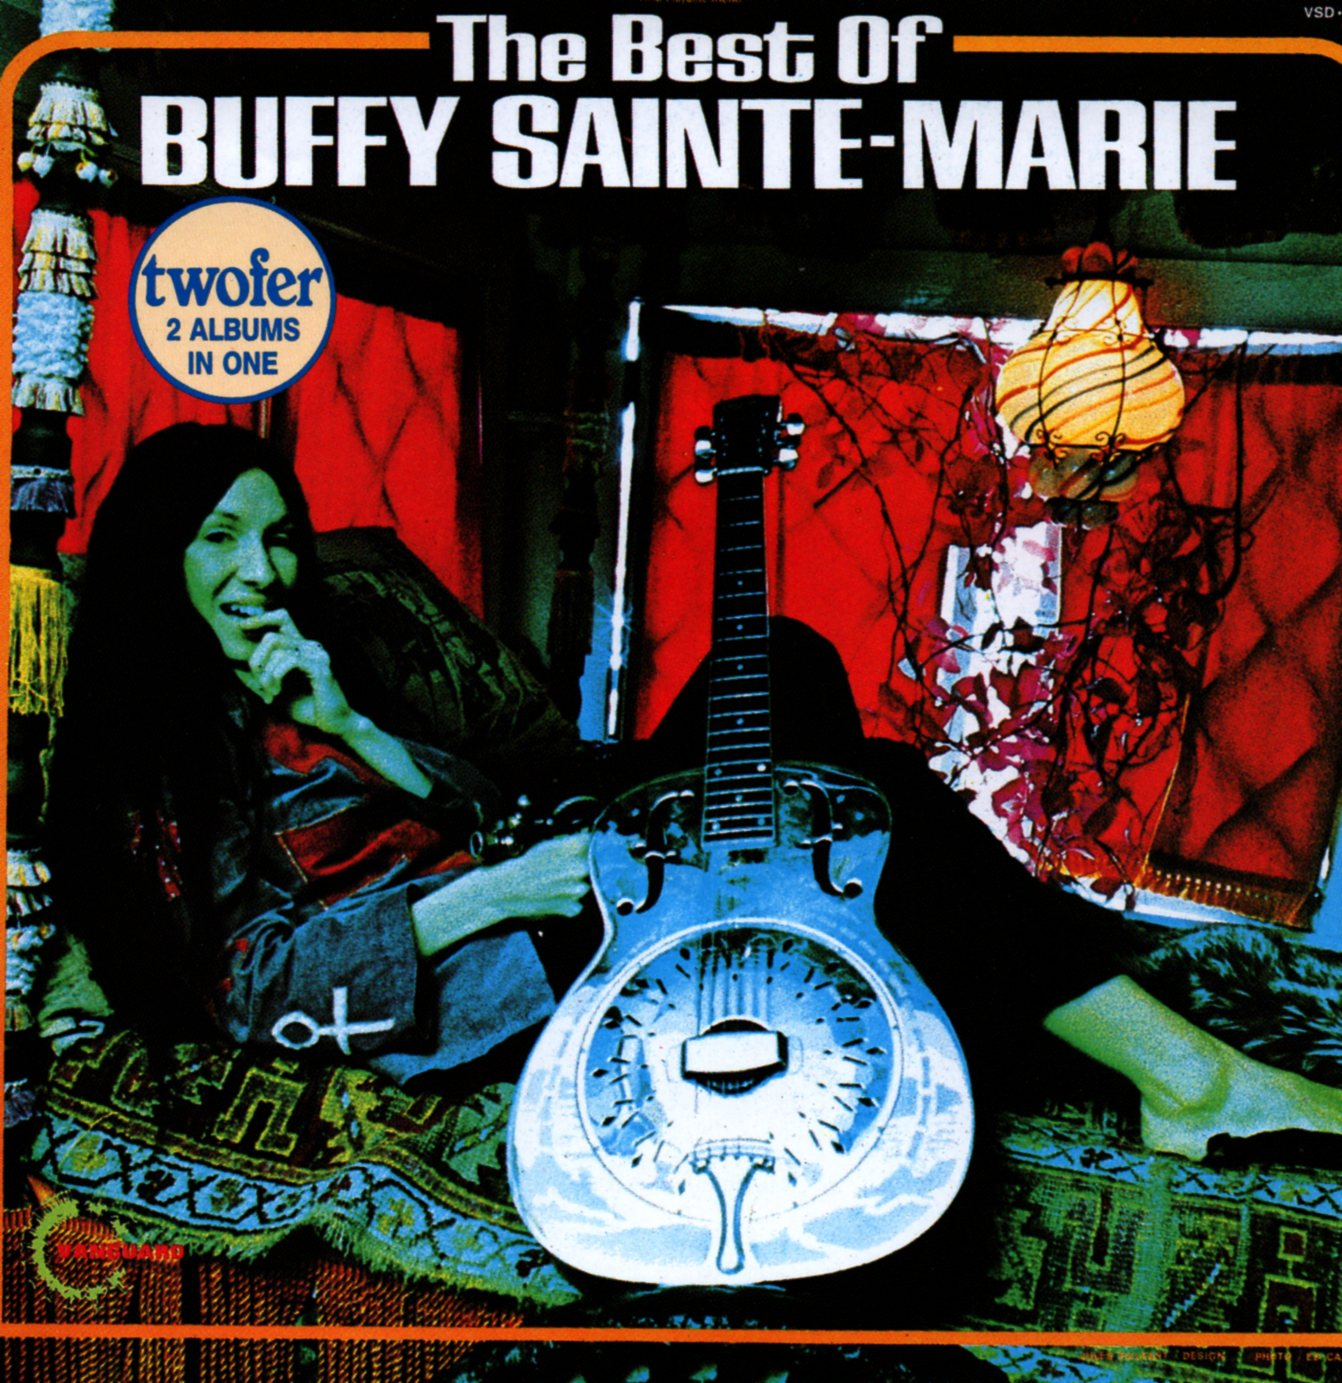 BUFFY SAINTE-MARIE - The best of - CD